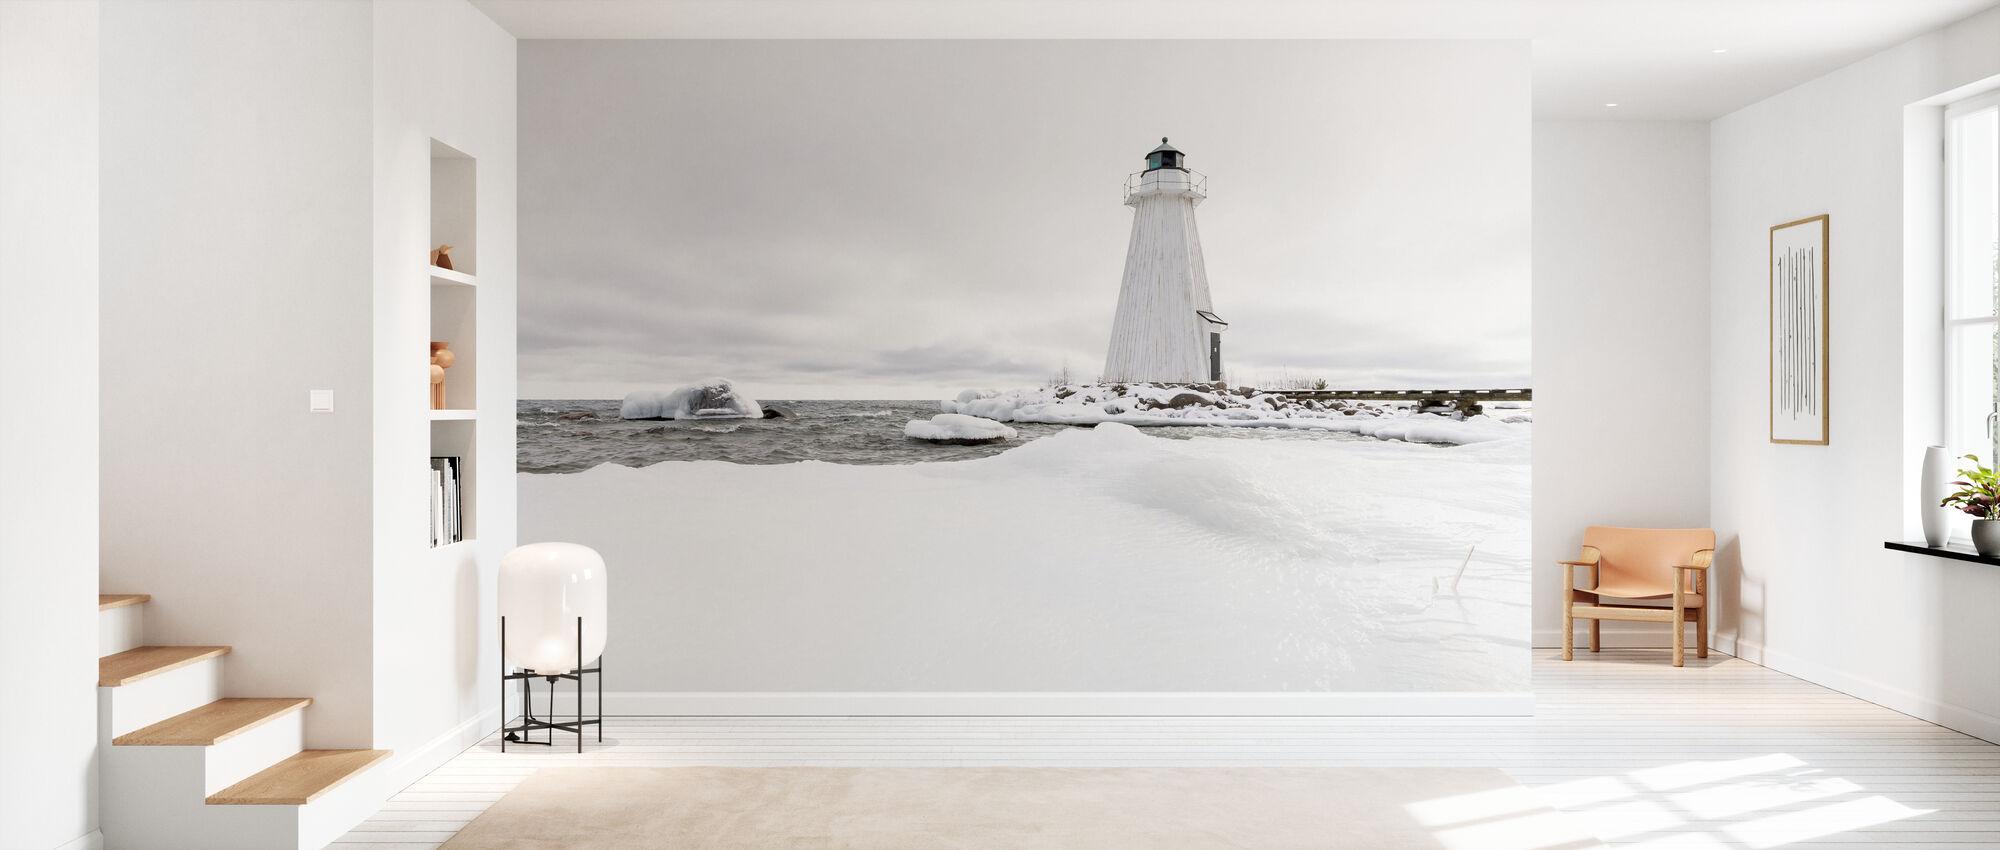 Lighthouse in Winter - Wallpaper - Hallway